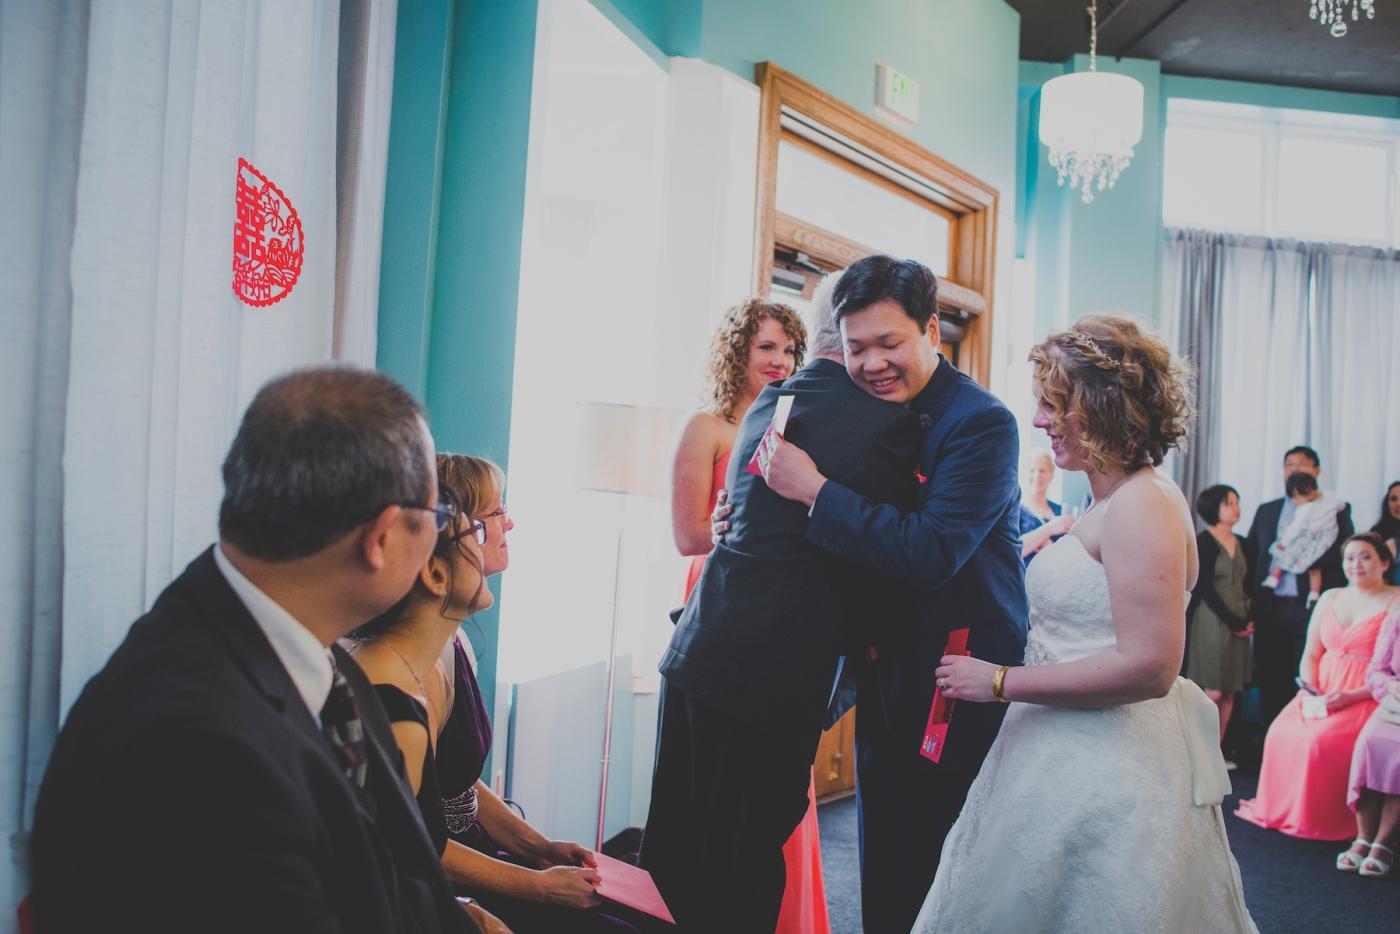 DSC_3006Everett_Wedding_Ballroom_Jane_Speleers_photography_Rachel_and_Edmund_teaceremony_2017